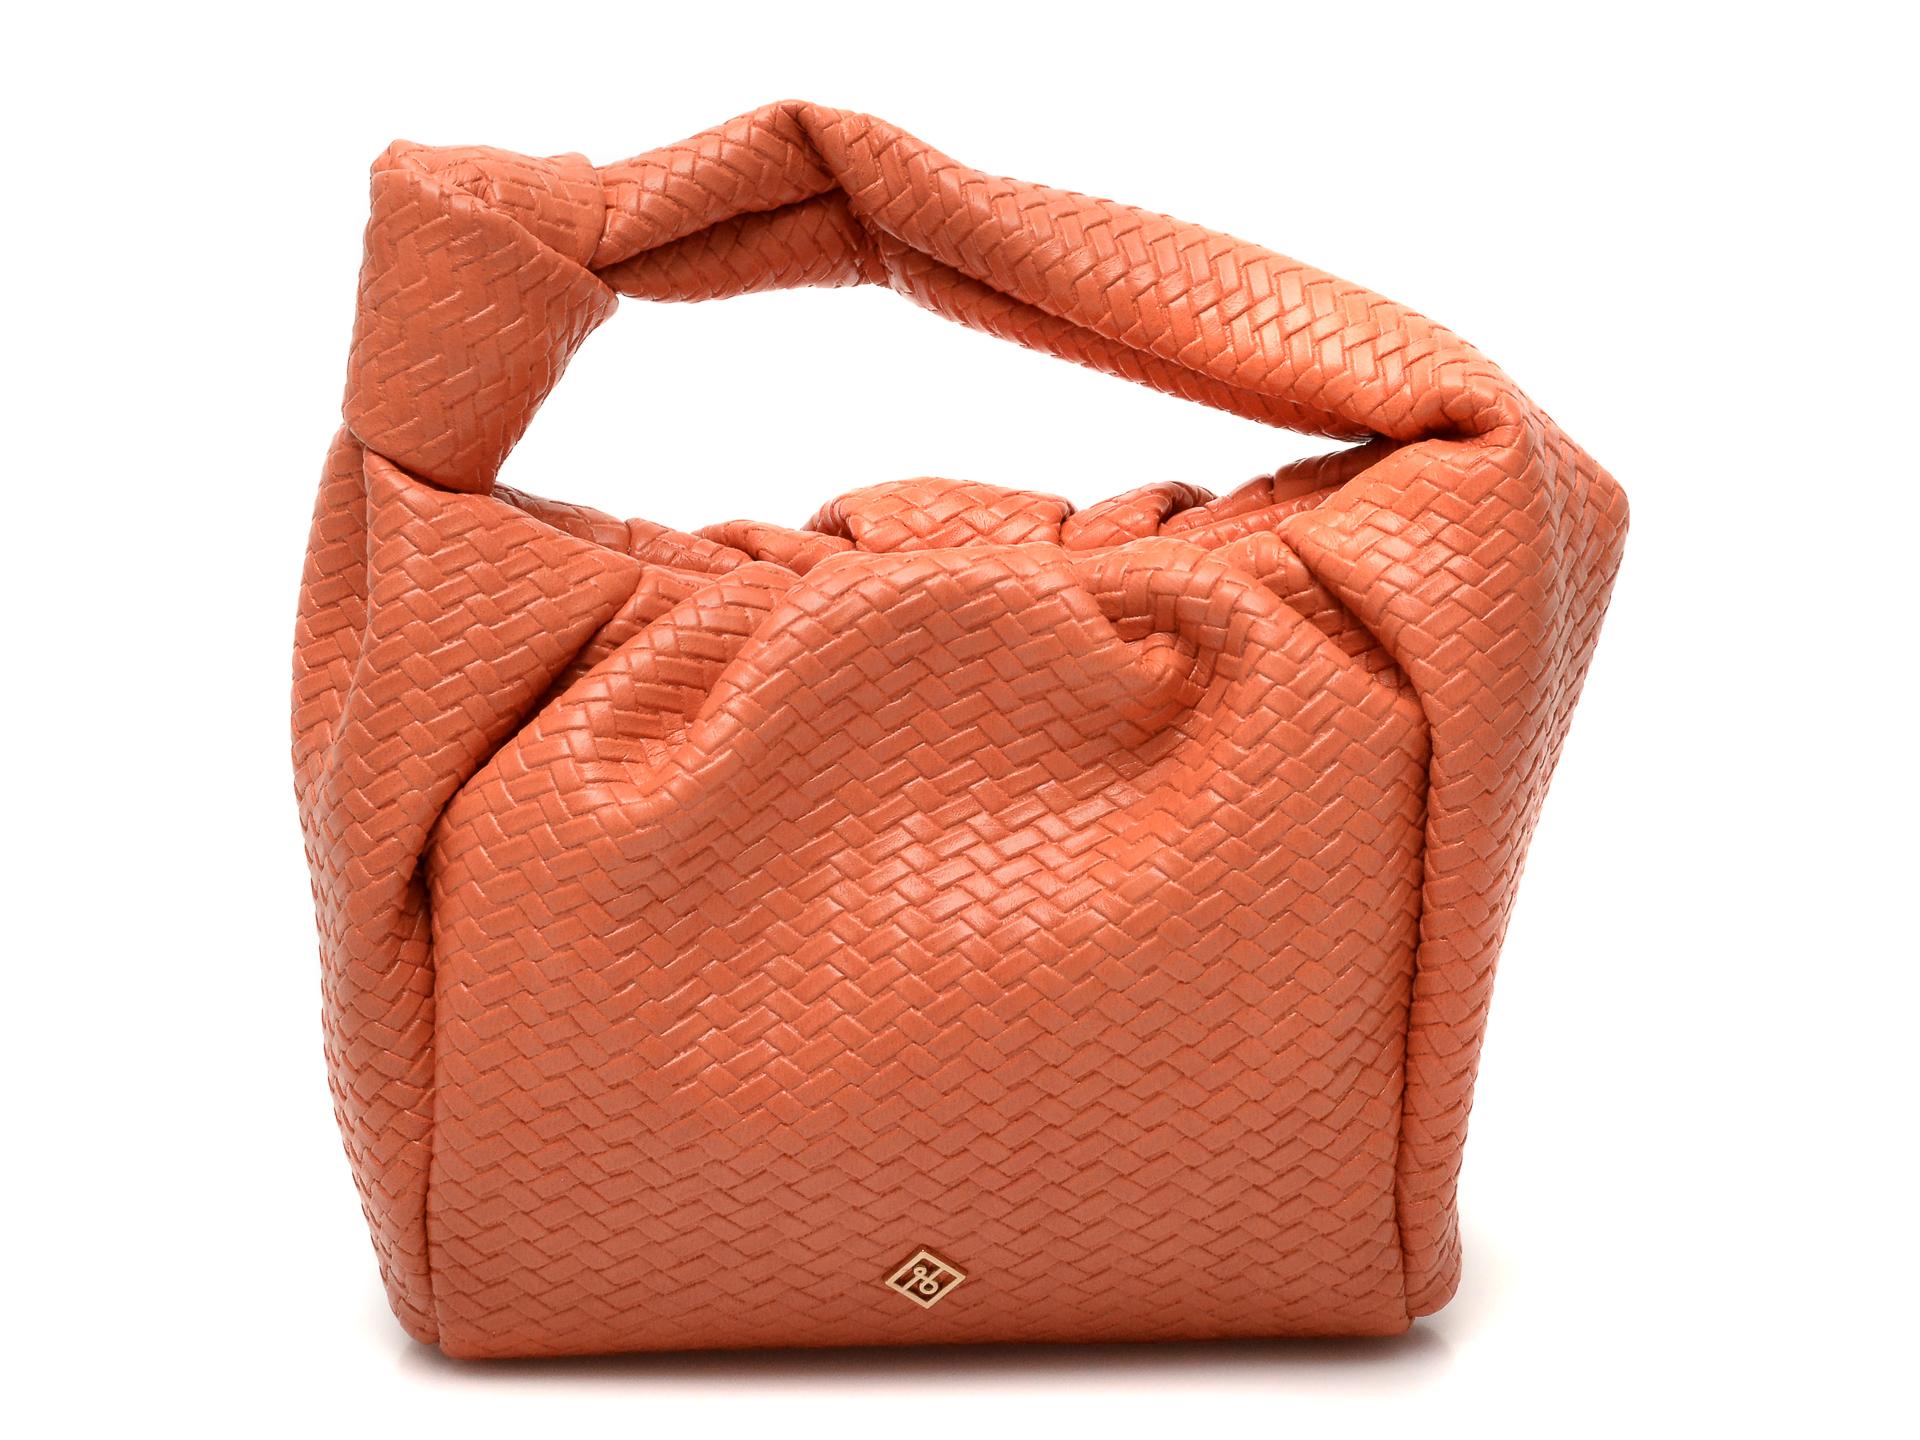 Poseta CALL IT SPRING portocalie, UNAU830, din piele ecologica imagine otter.ro 2021